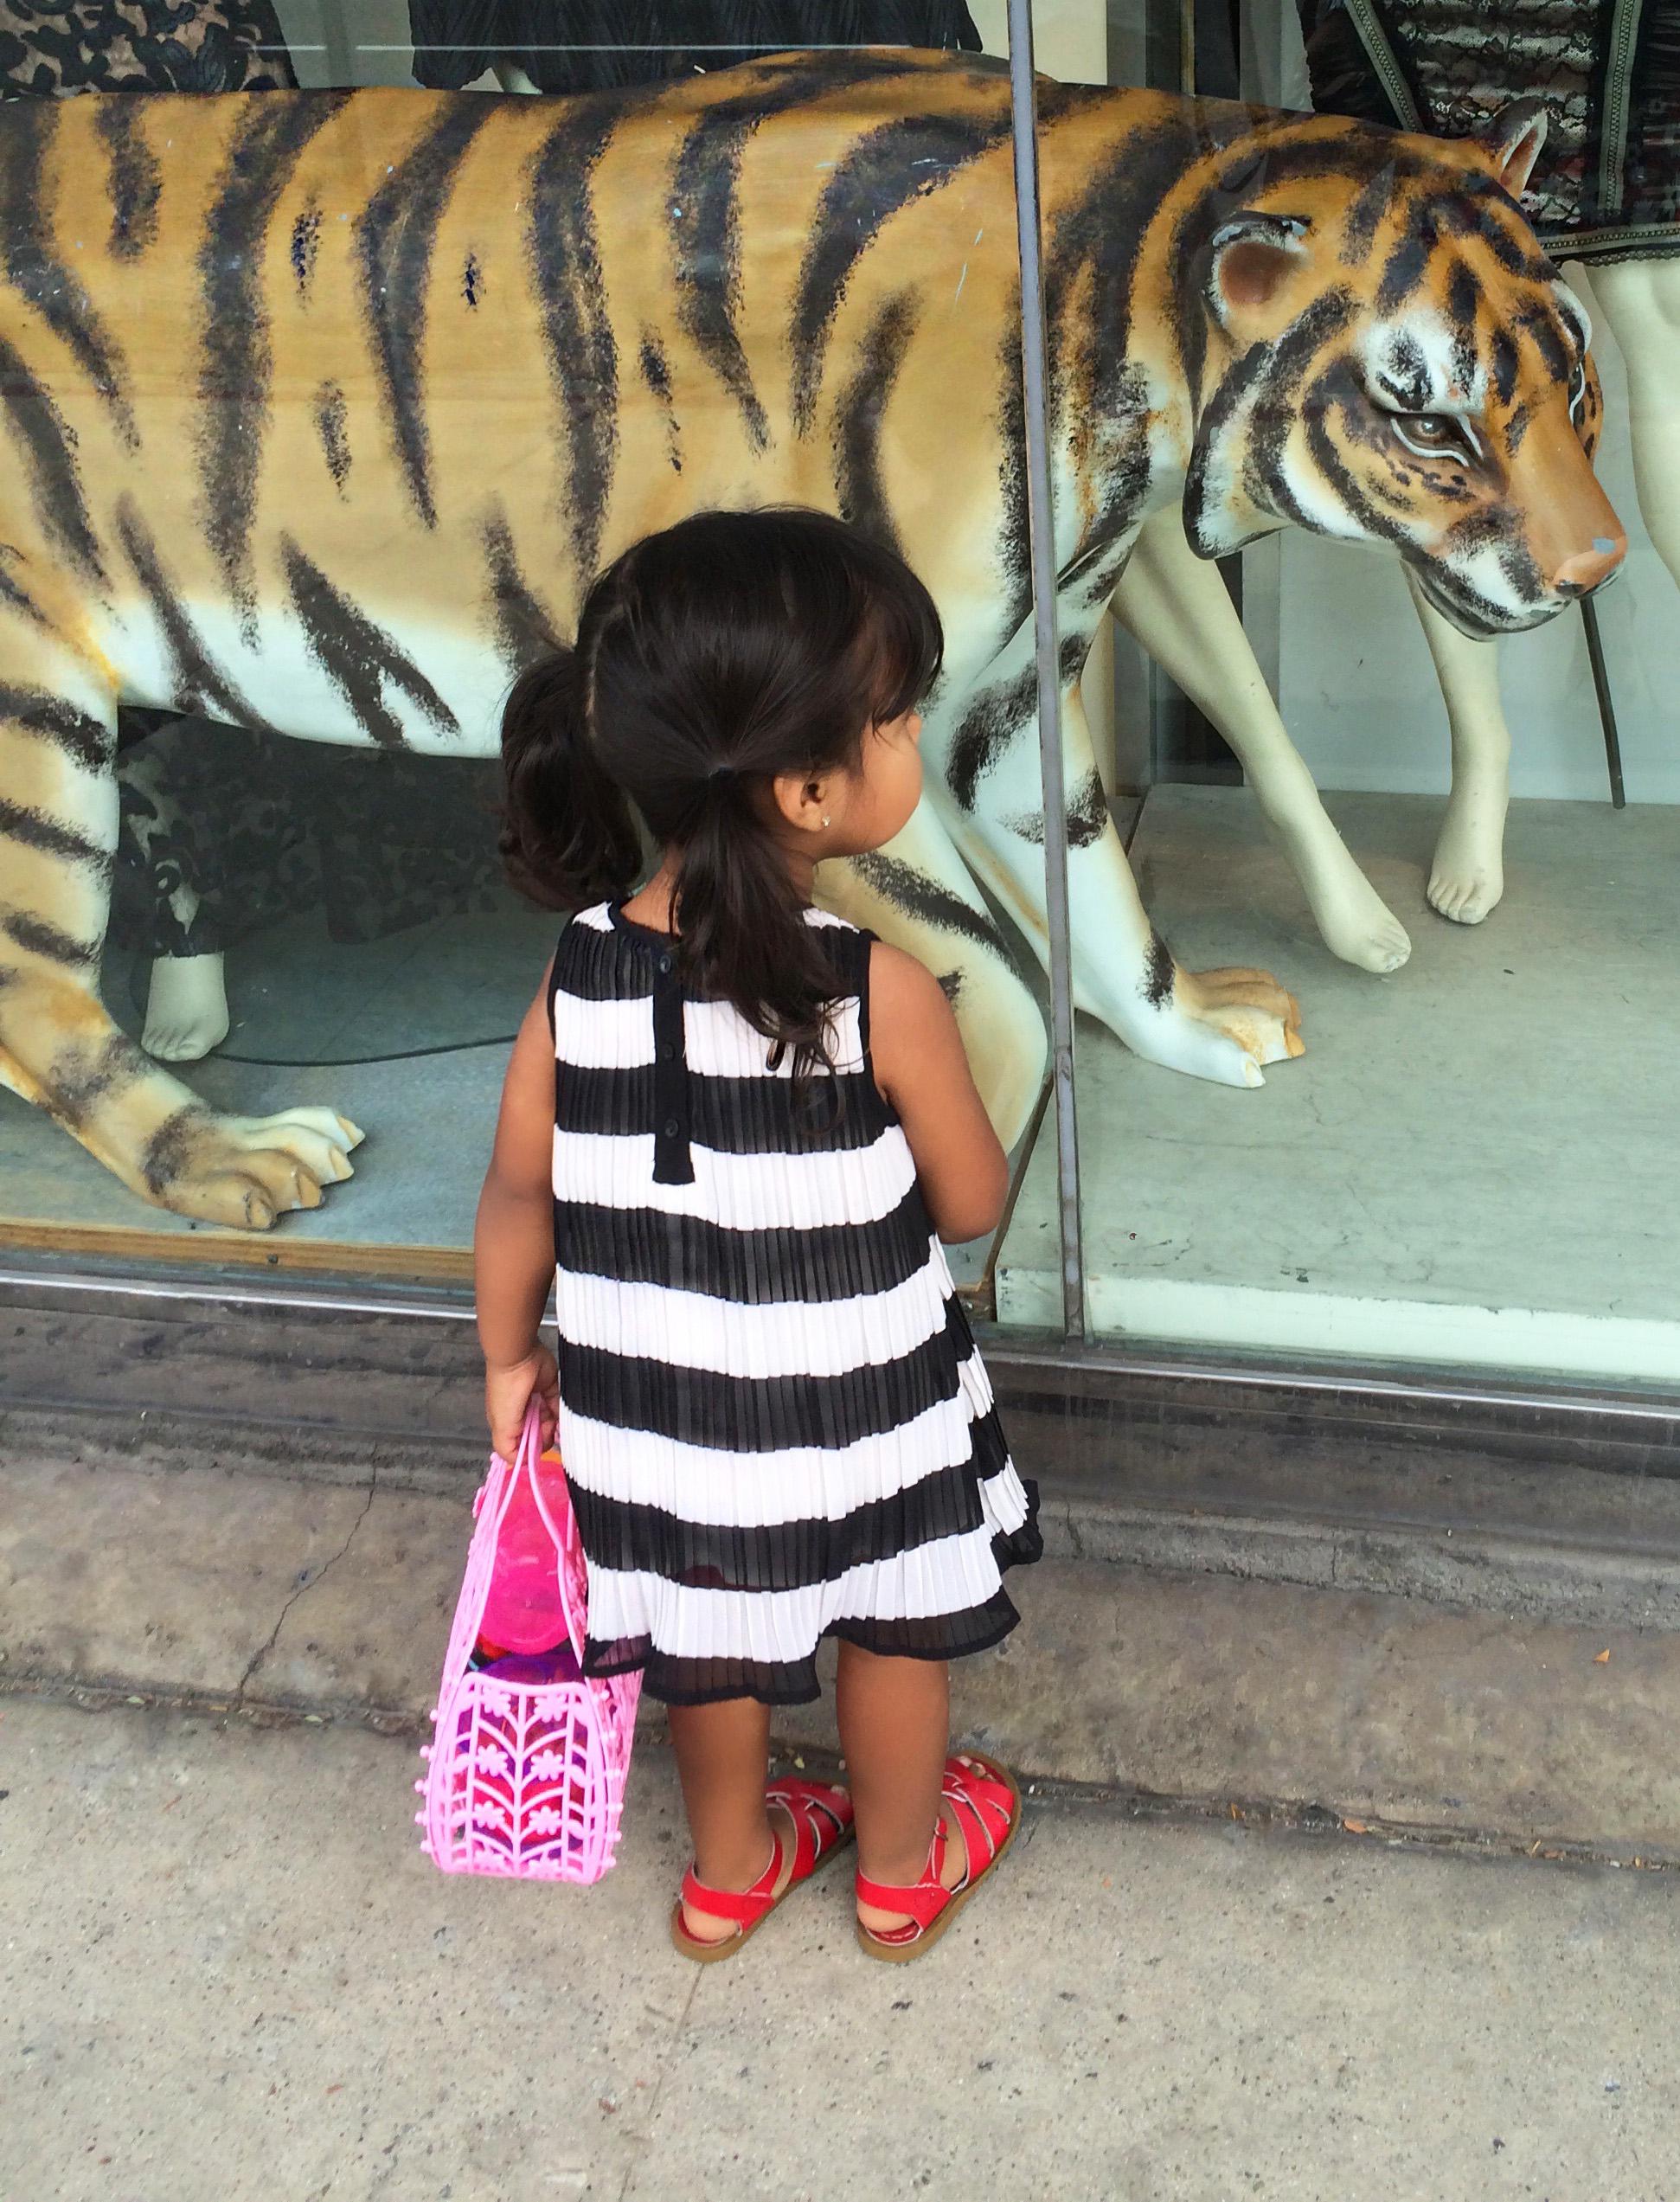 red dress_tiger